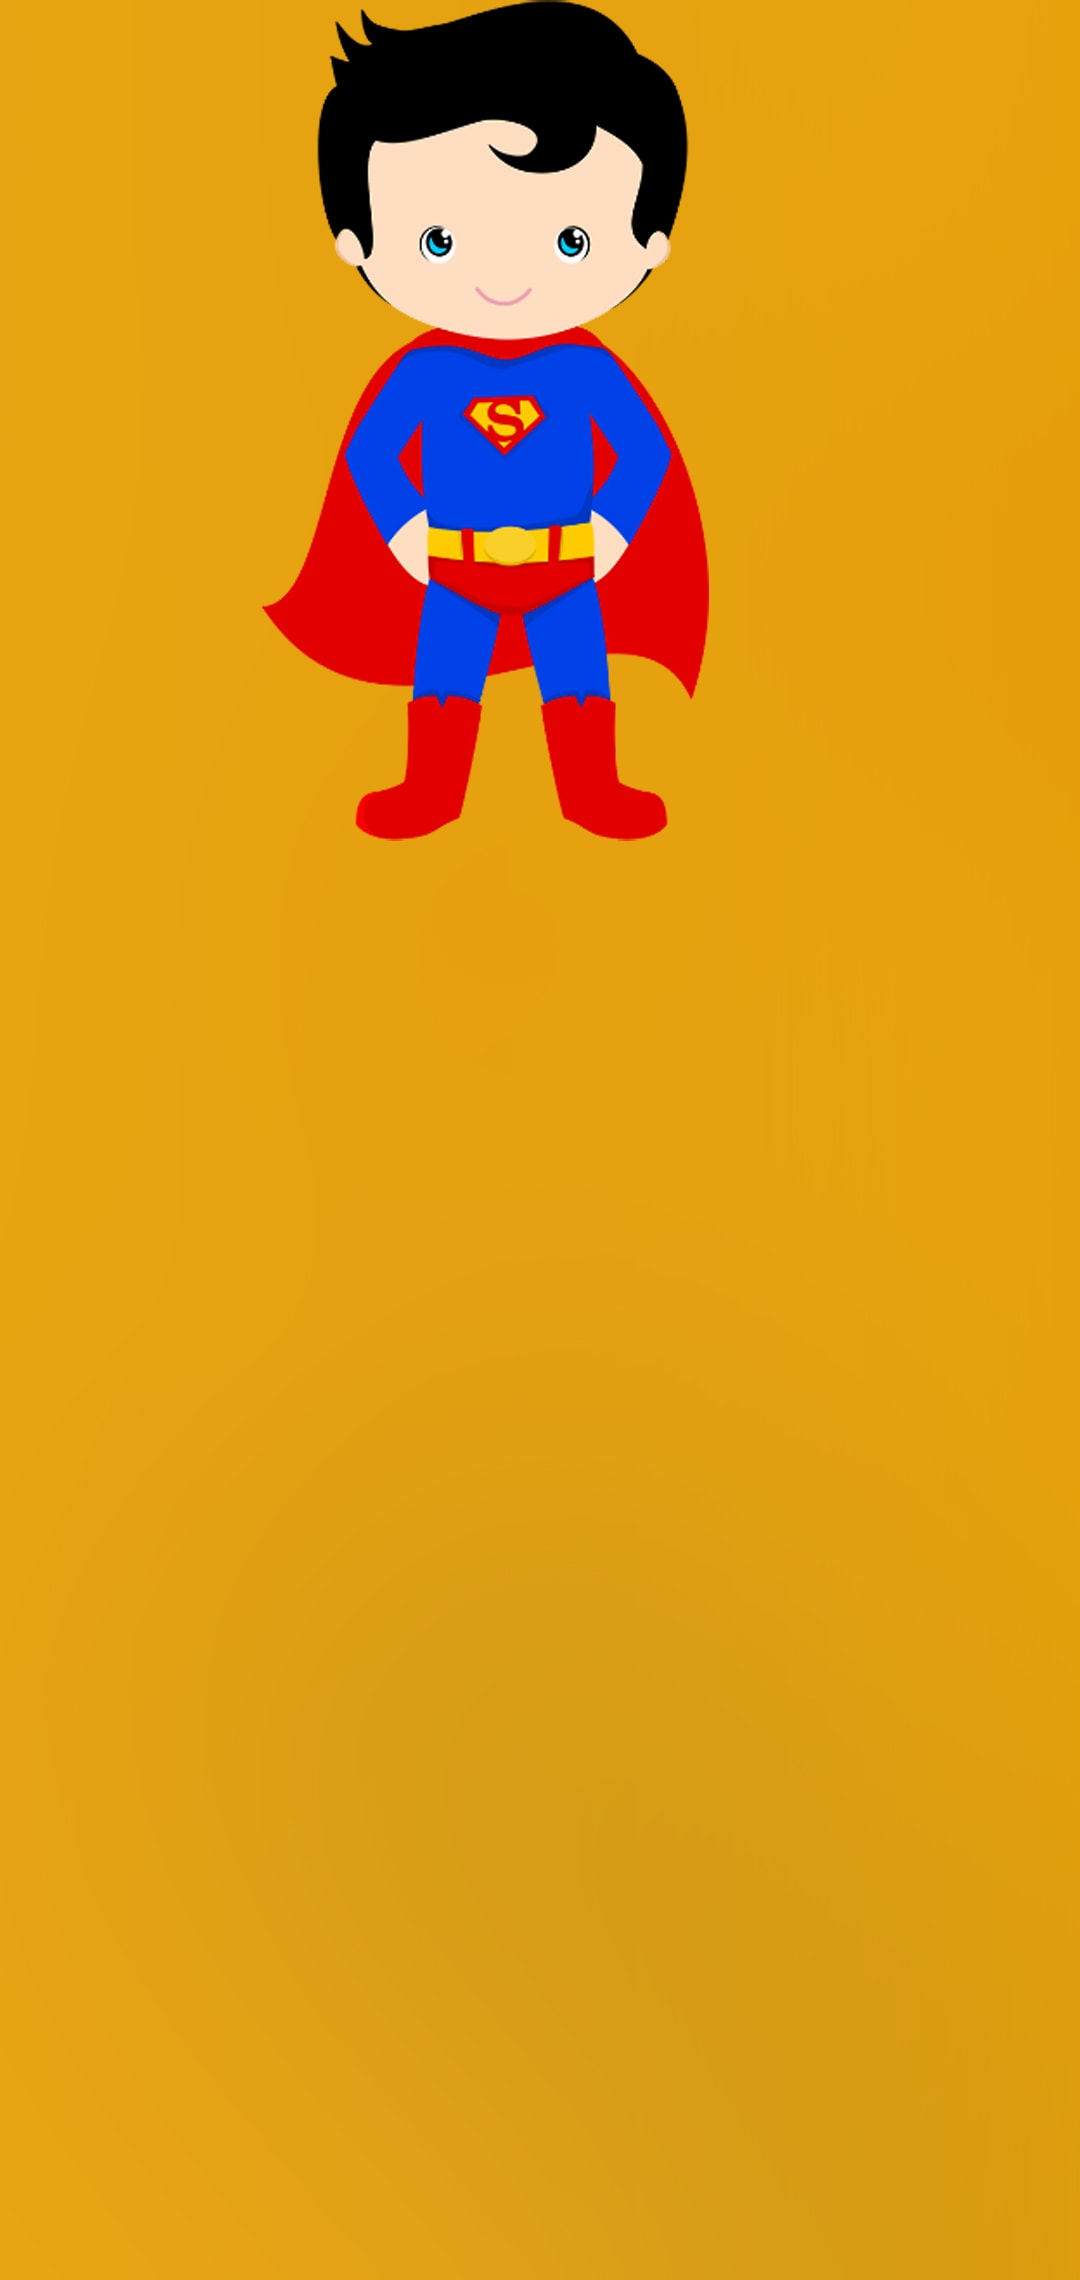 hole punch walls little superman